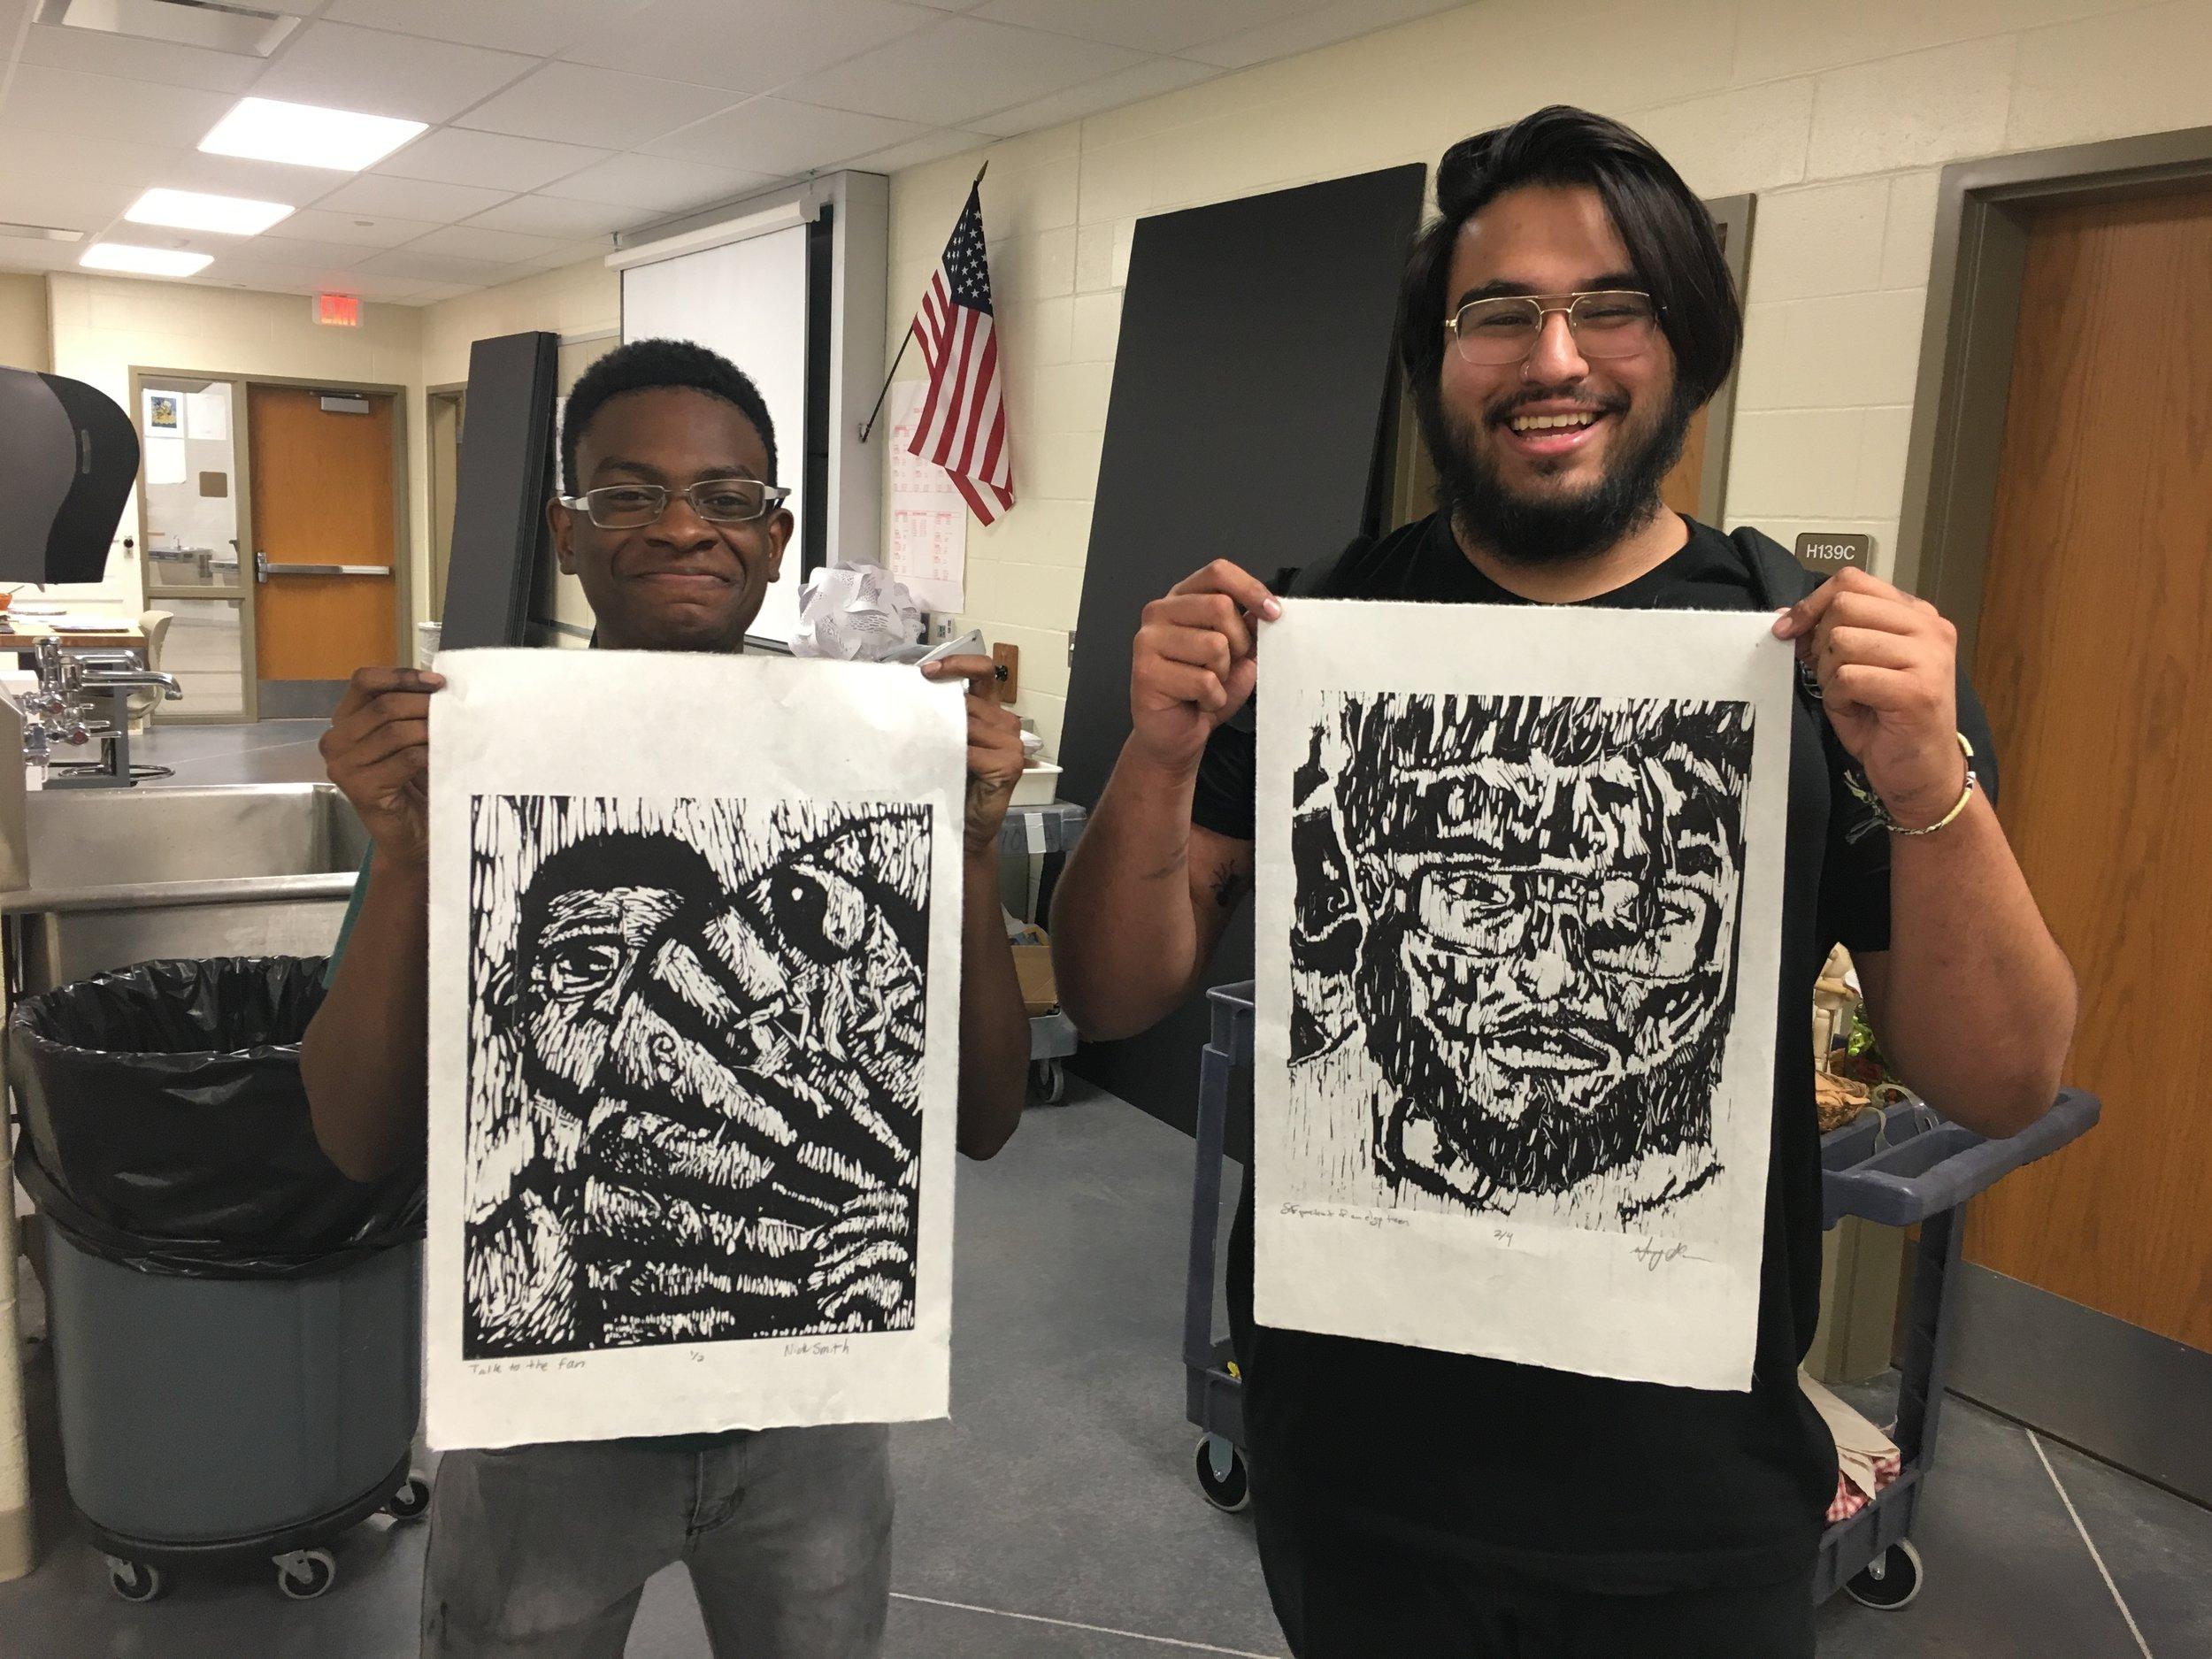 Nick & Manny self-portraits